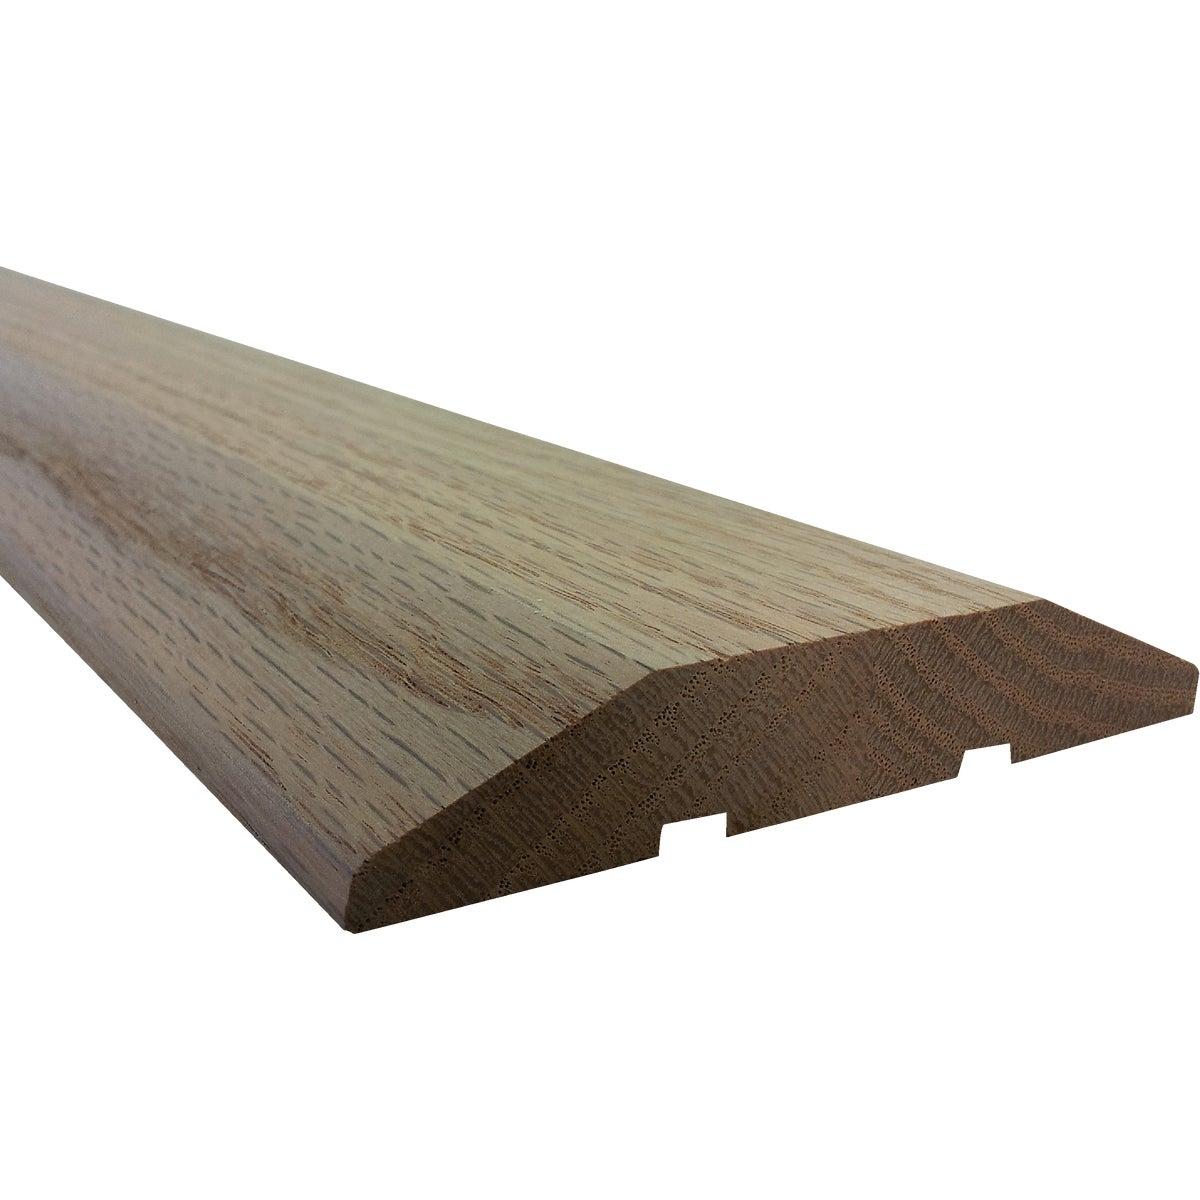 5/8X3-1/2X37 Oak Thresh